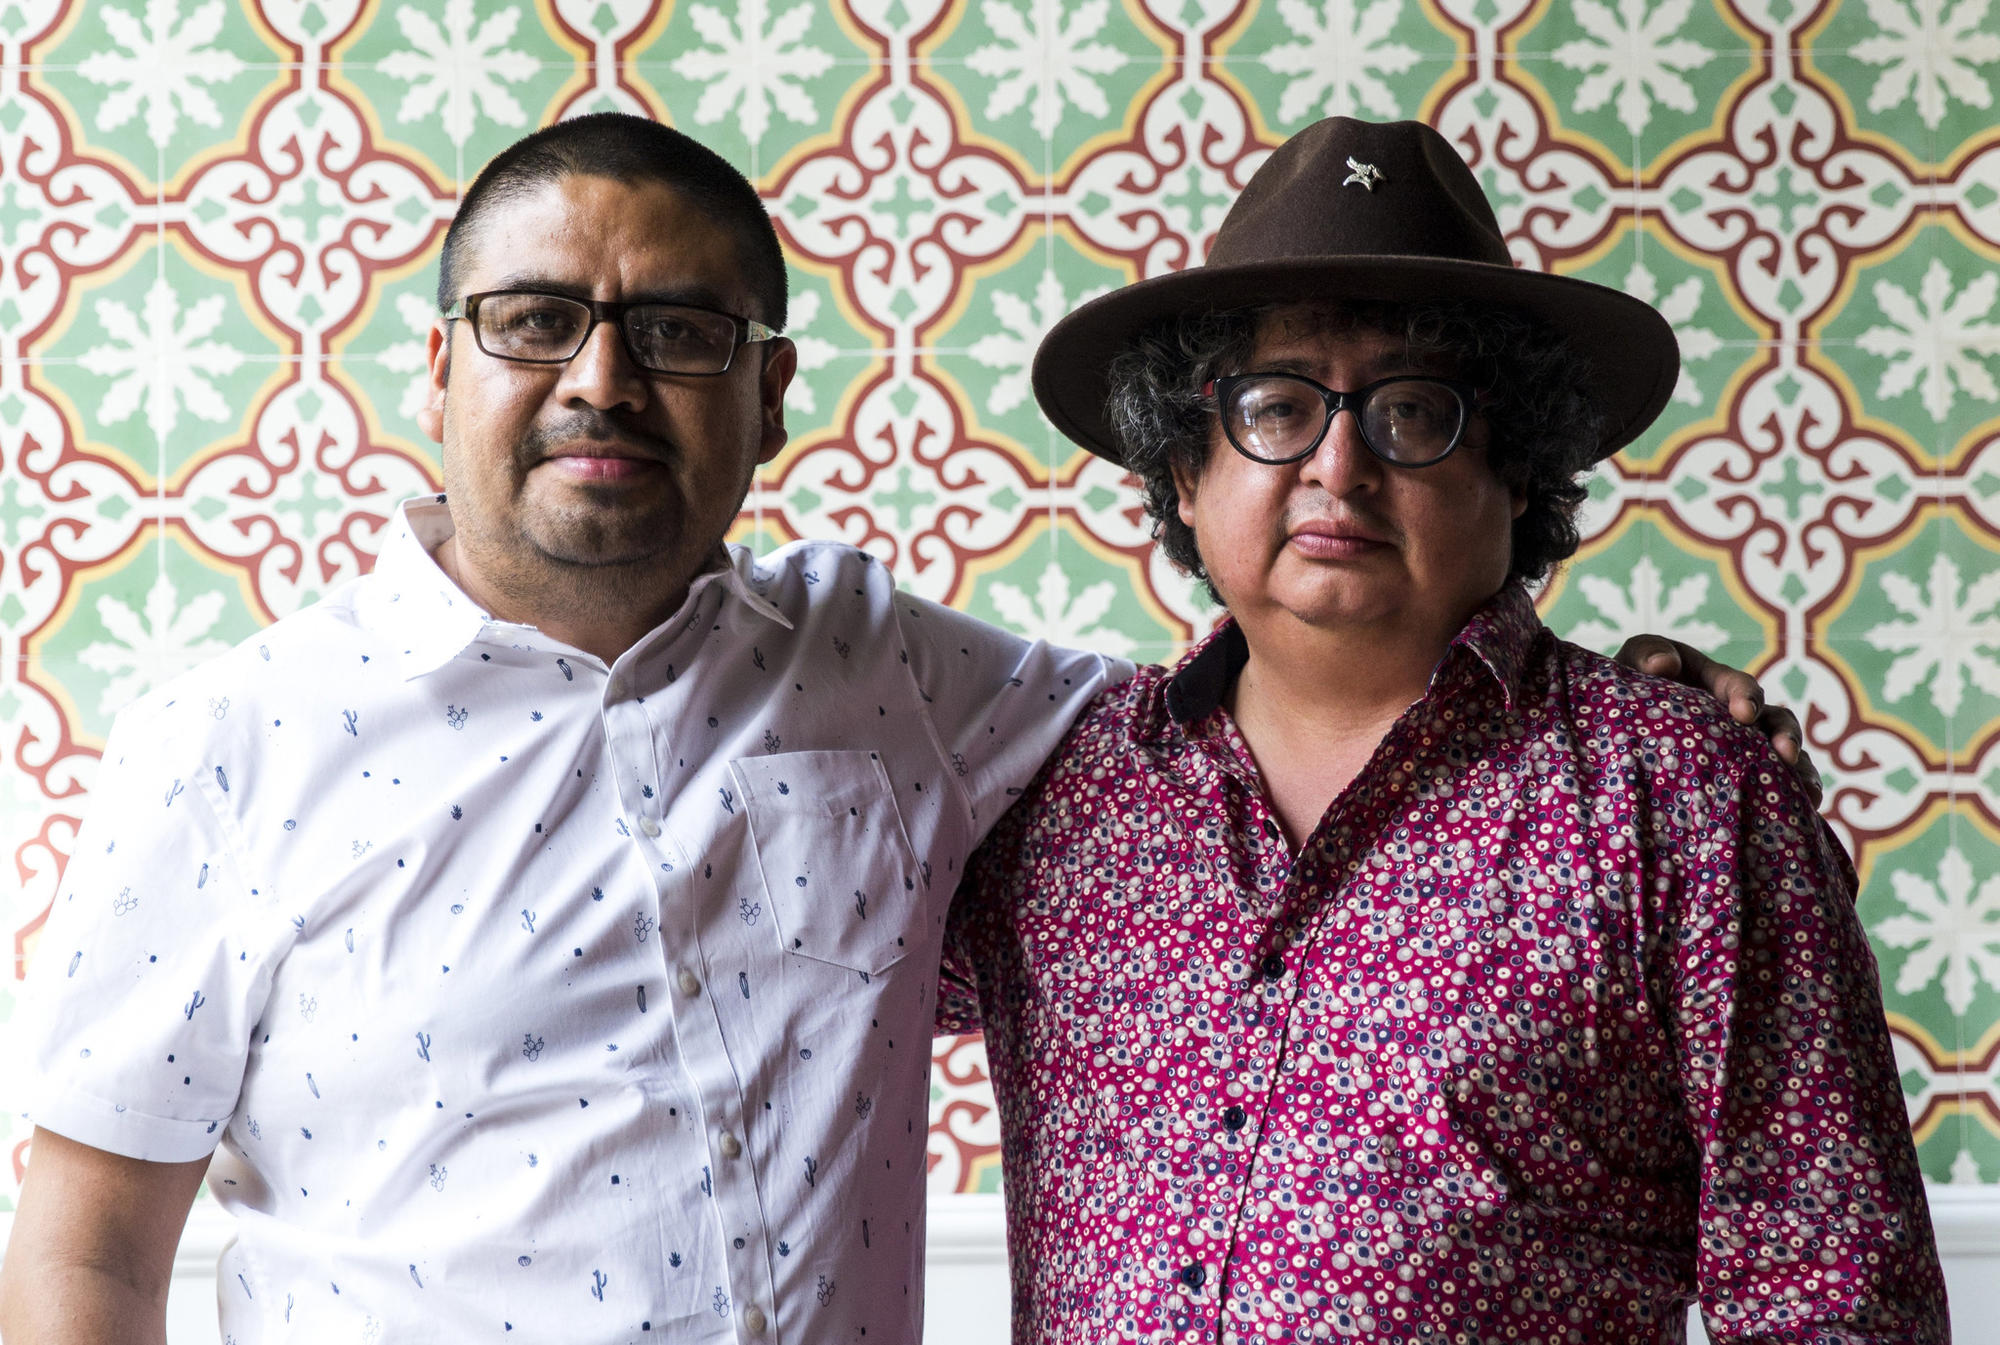 Mezcal crawl with Ulises Torrentera